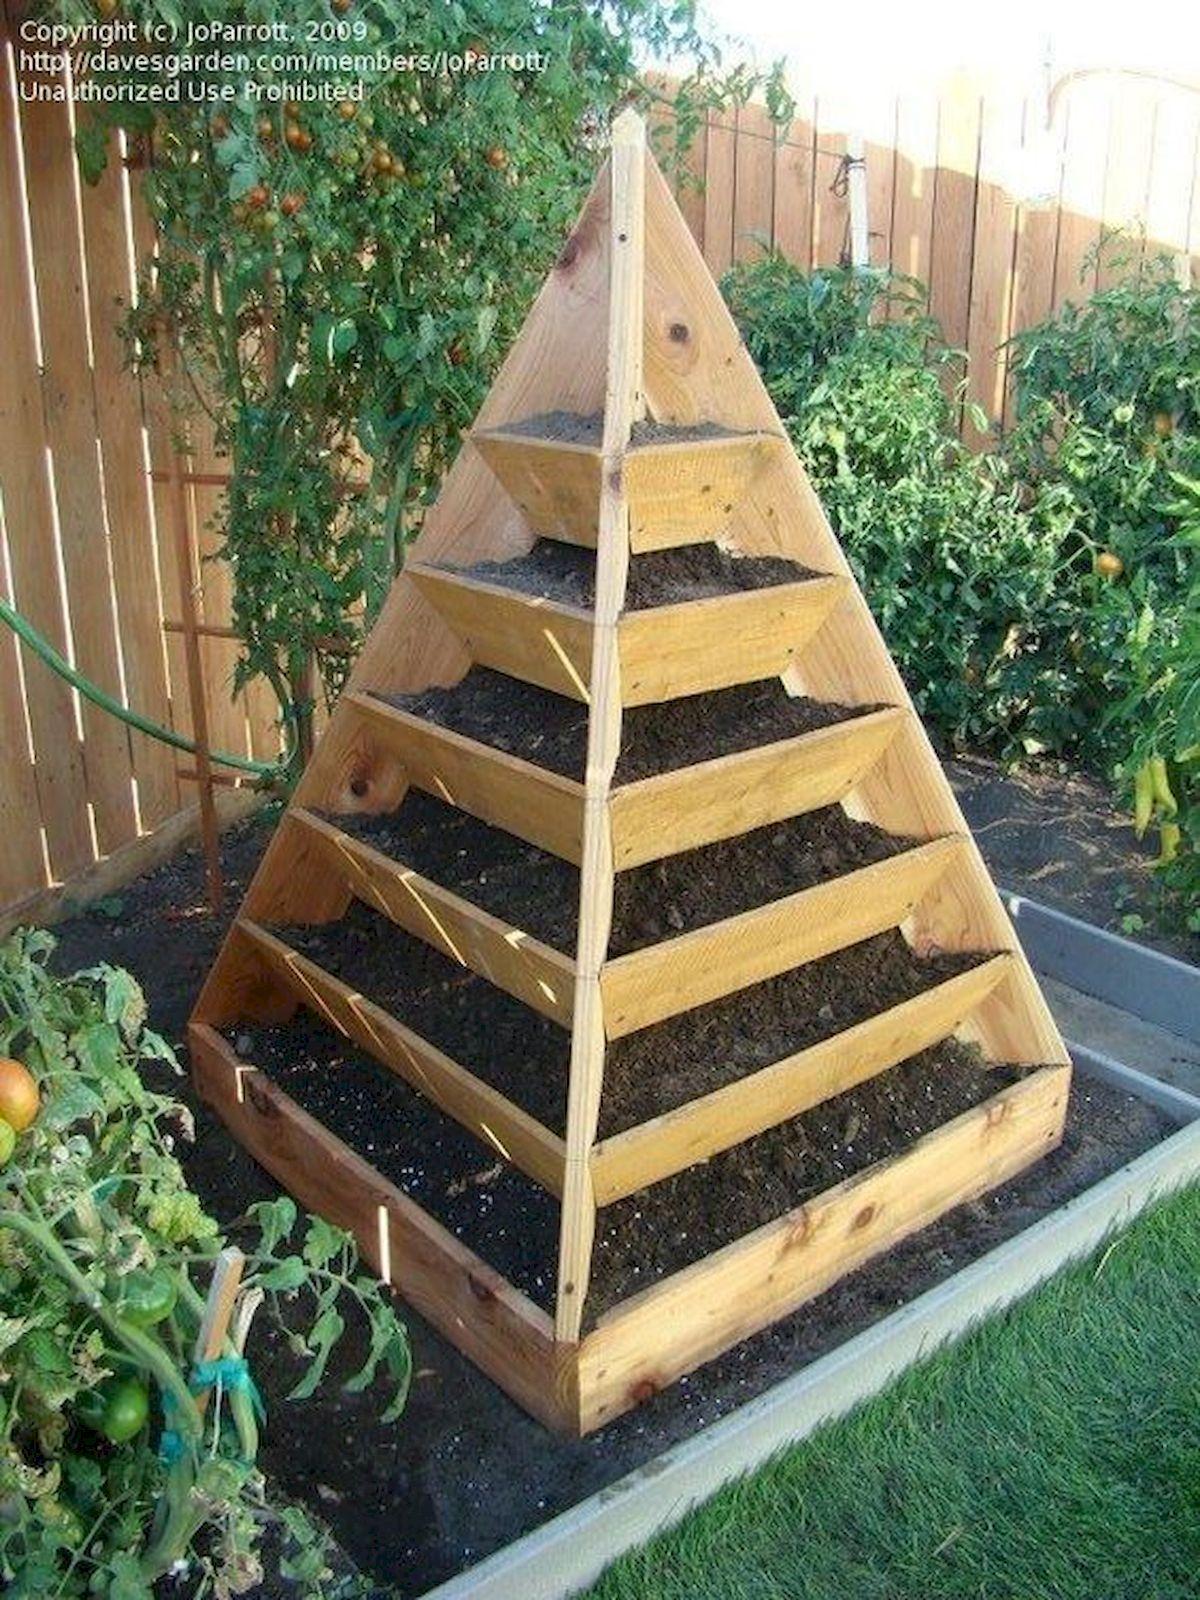 Bastelideen Garten Best Of 33 Stunning Herb Garden Design Ideas and Remodel – 33decor